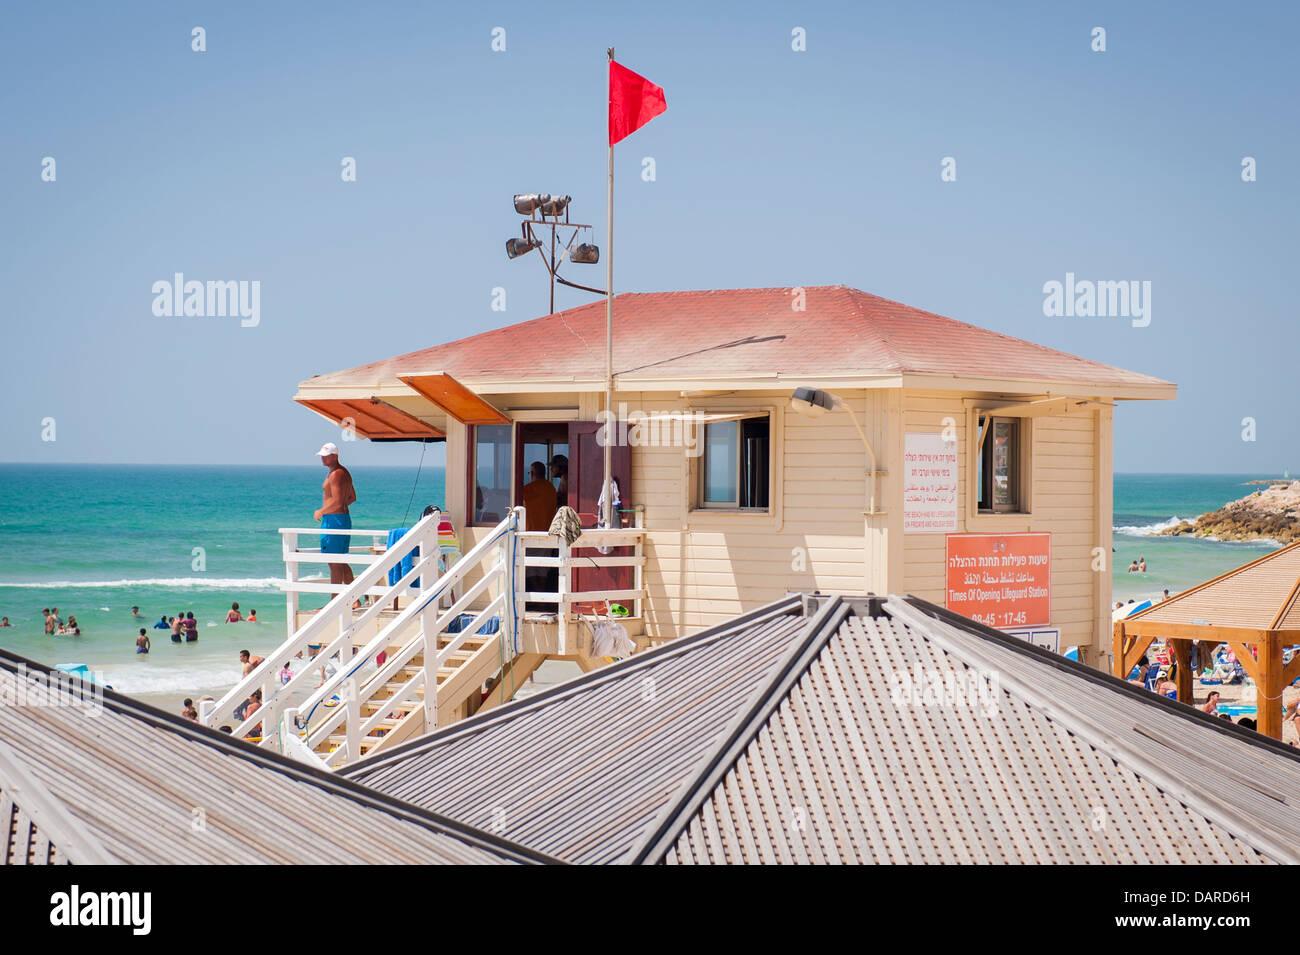 Israel Tel Aviv Jaffa Yafo Manta Ray Beach crowds life guards savers hut detail - Stock Image